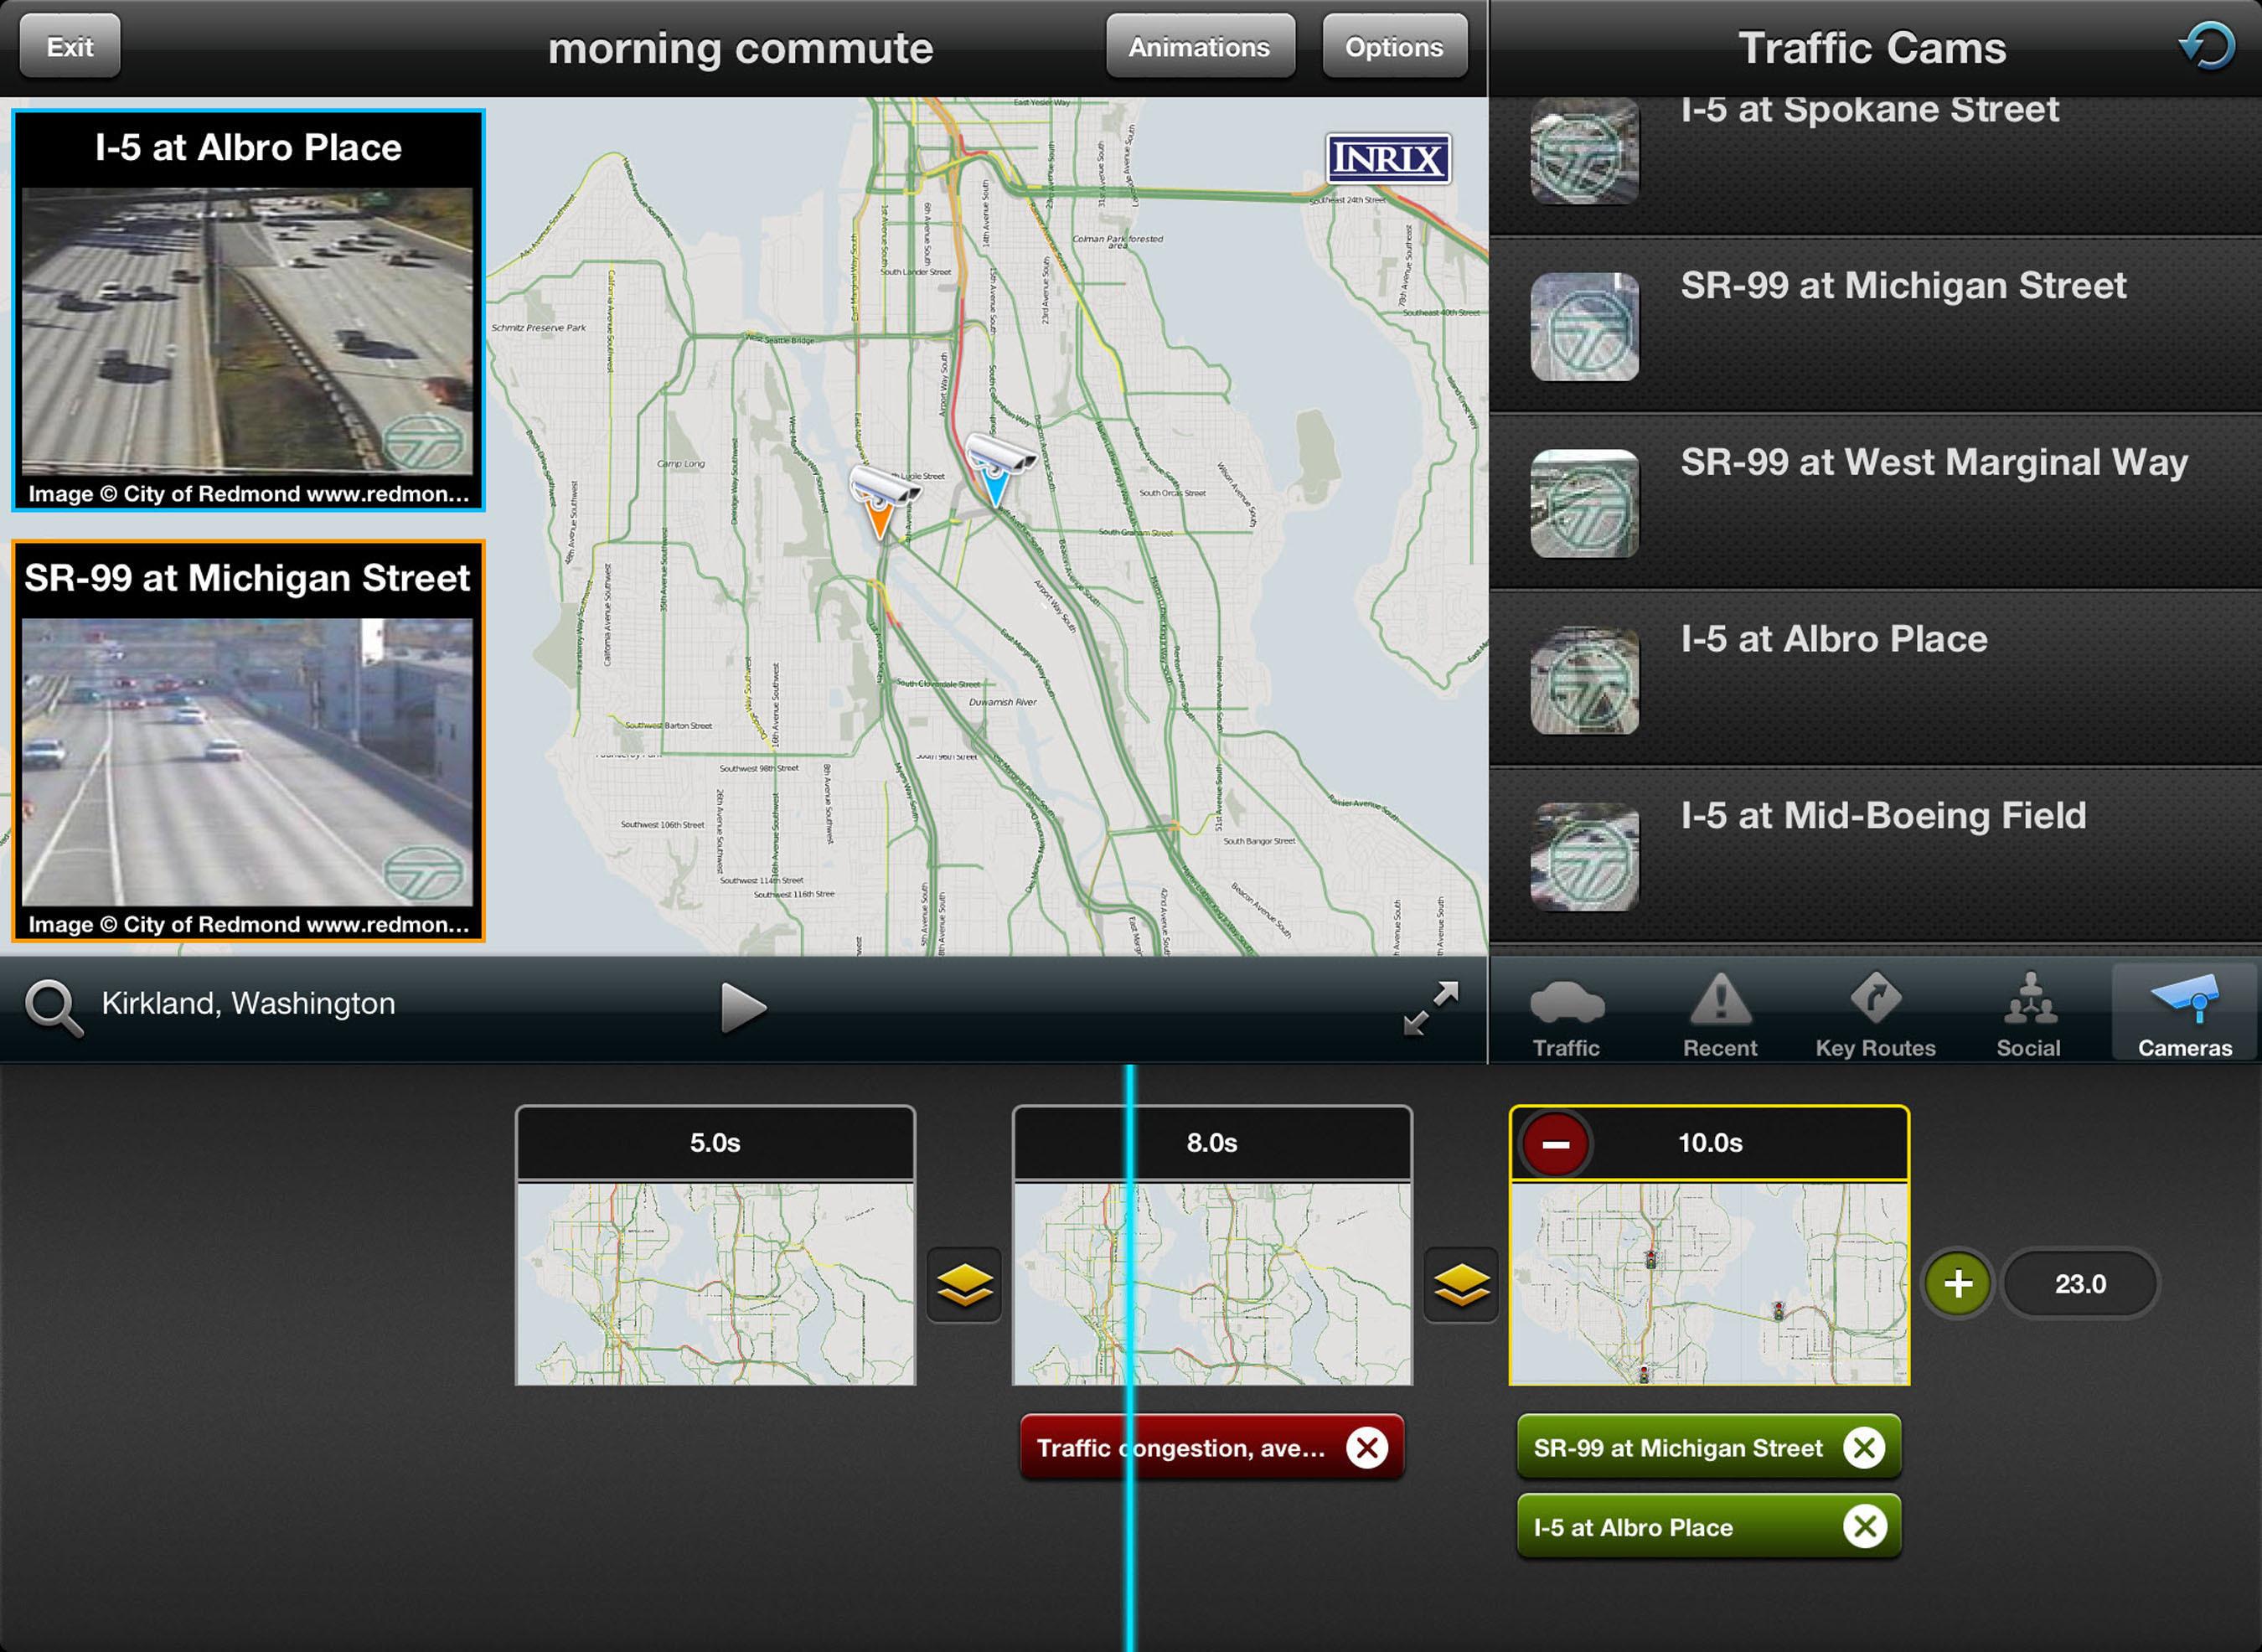 INRIX TV App Transforms Broadcast Traffic News